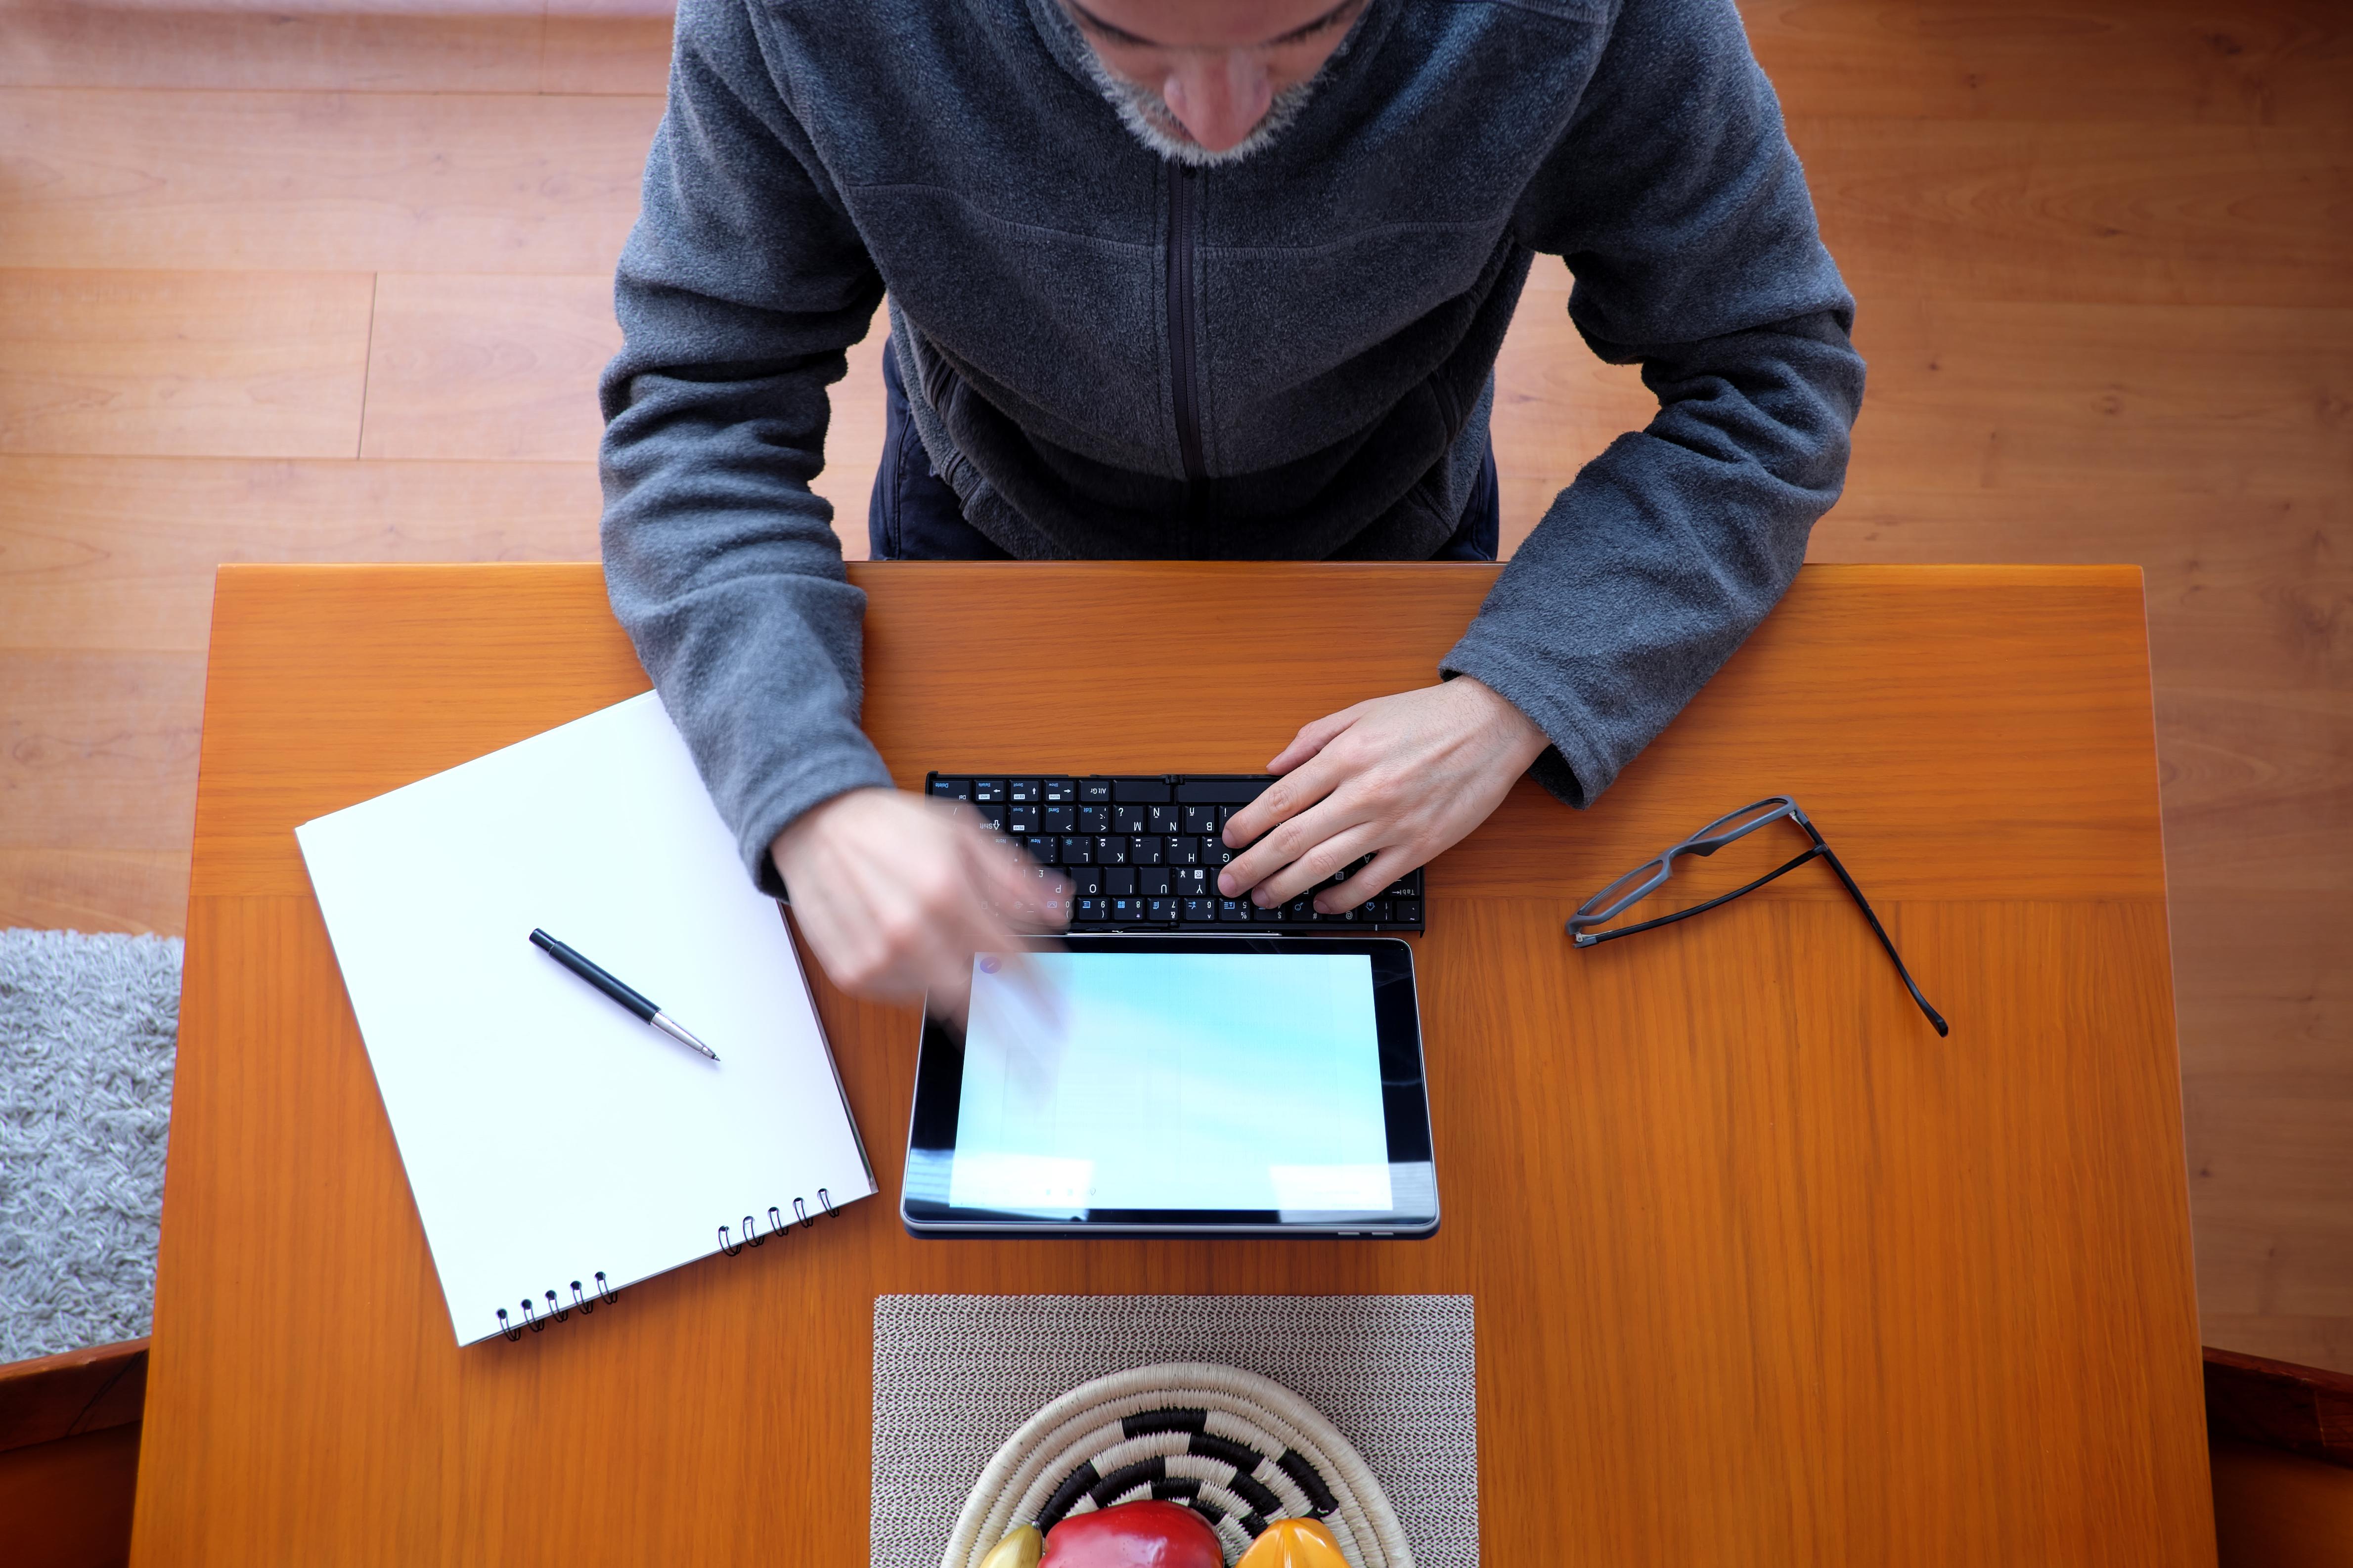 man sitting working at home